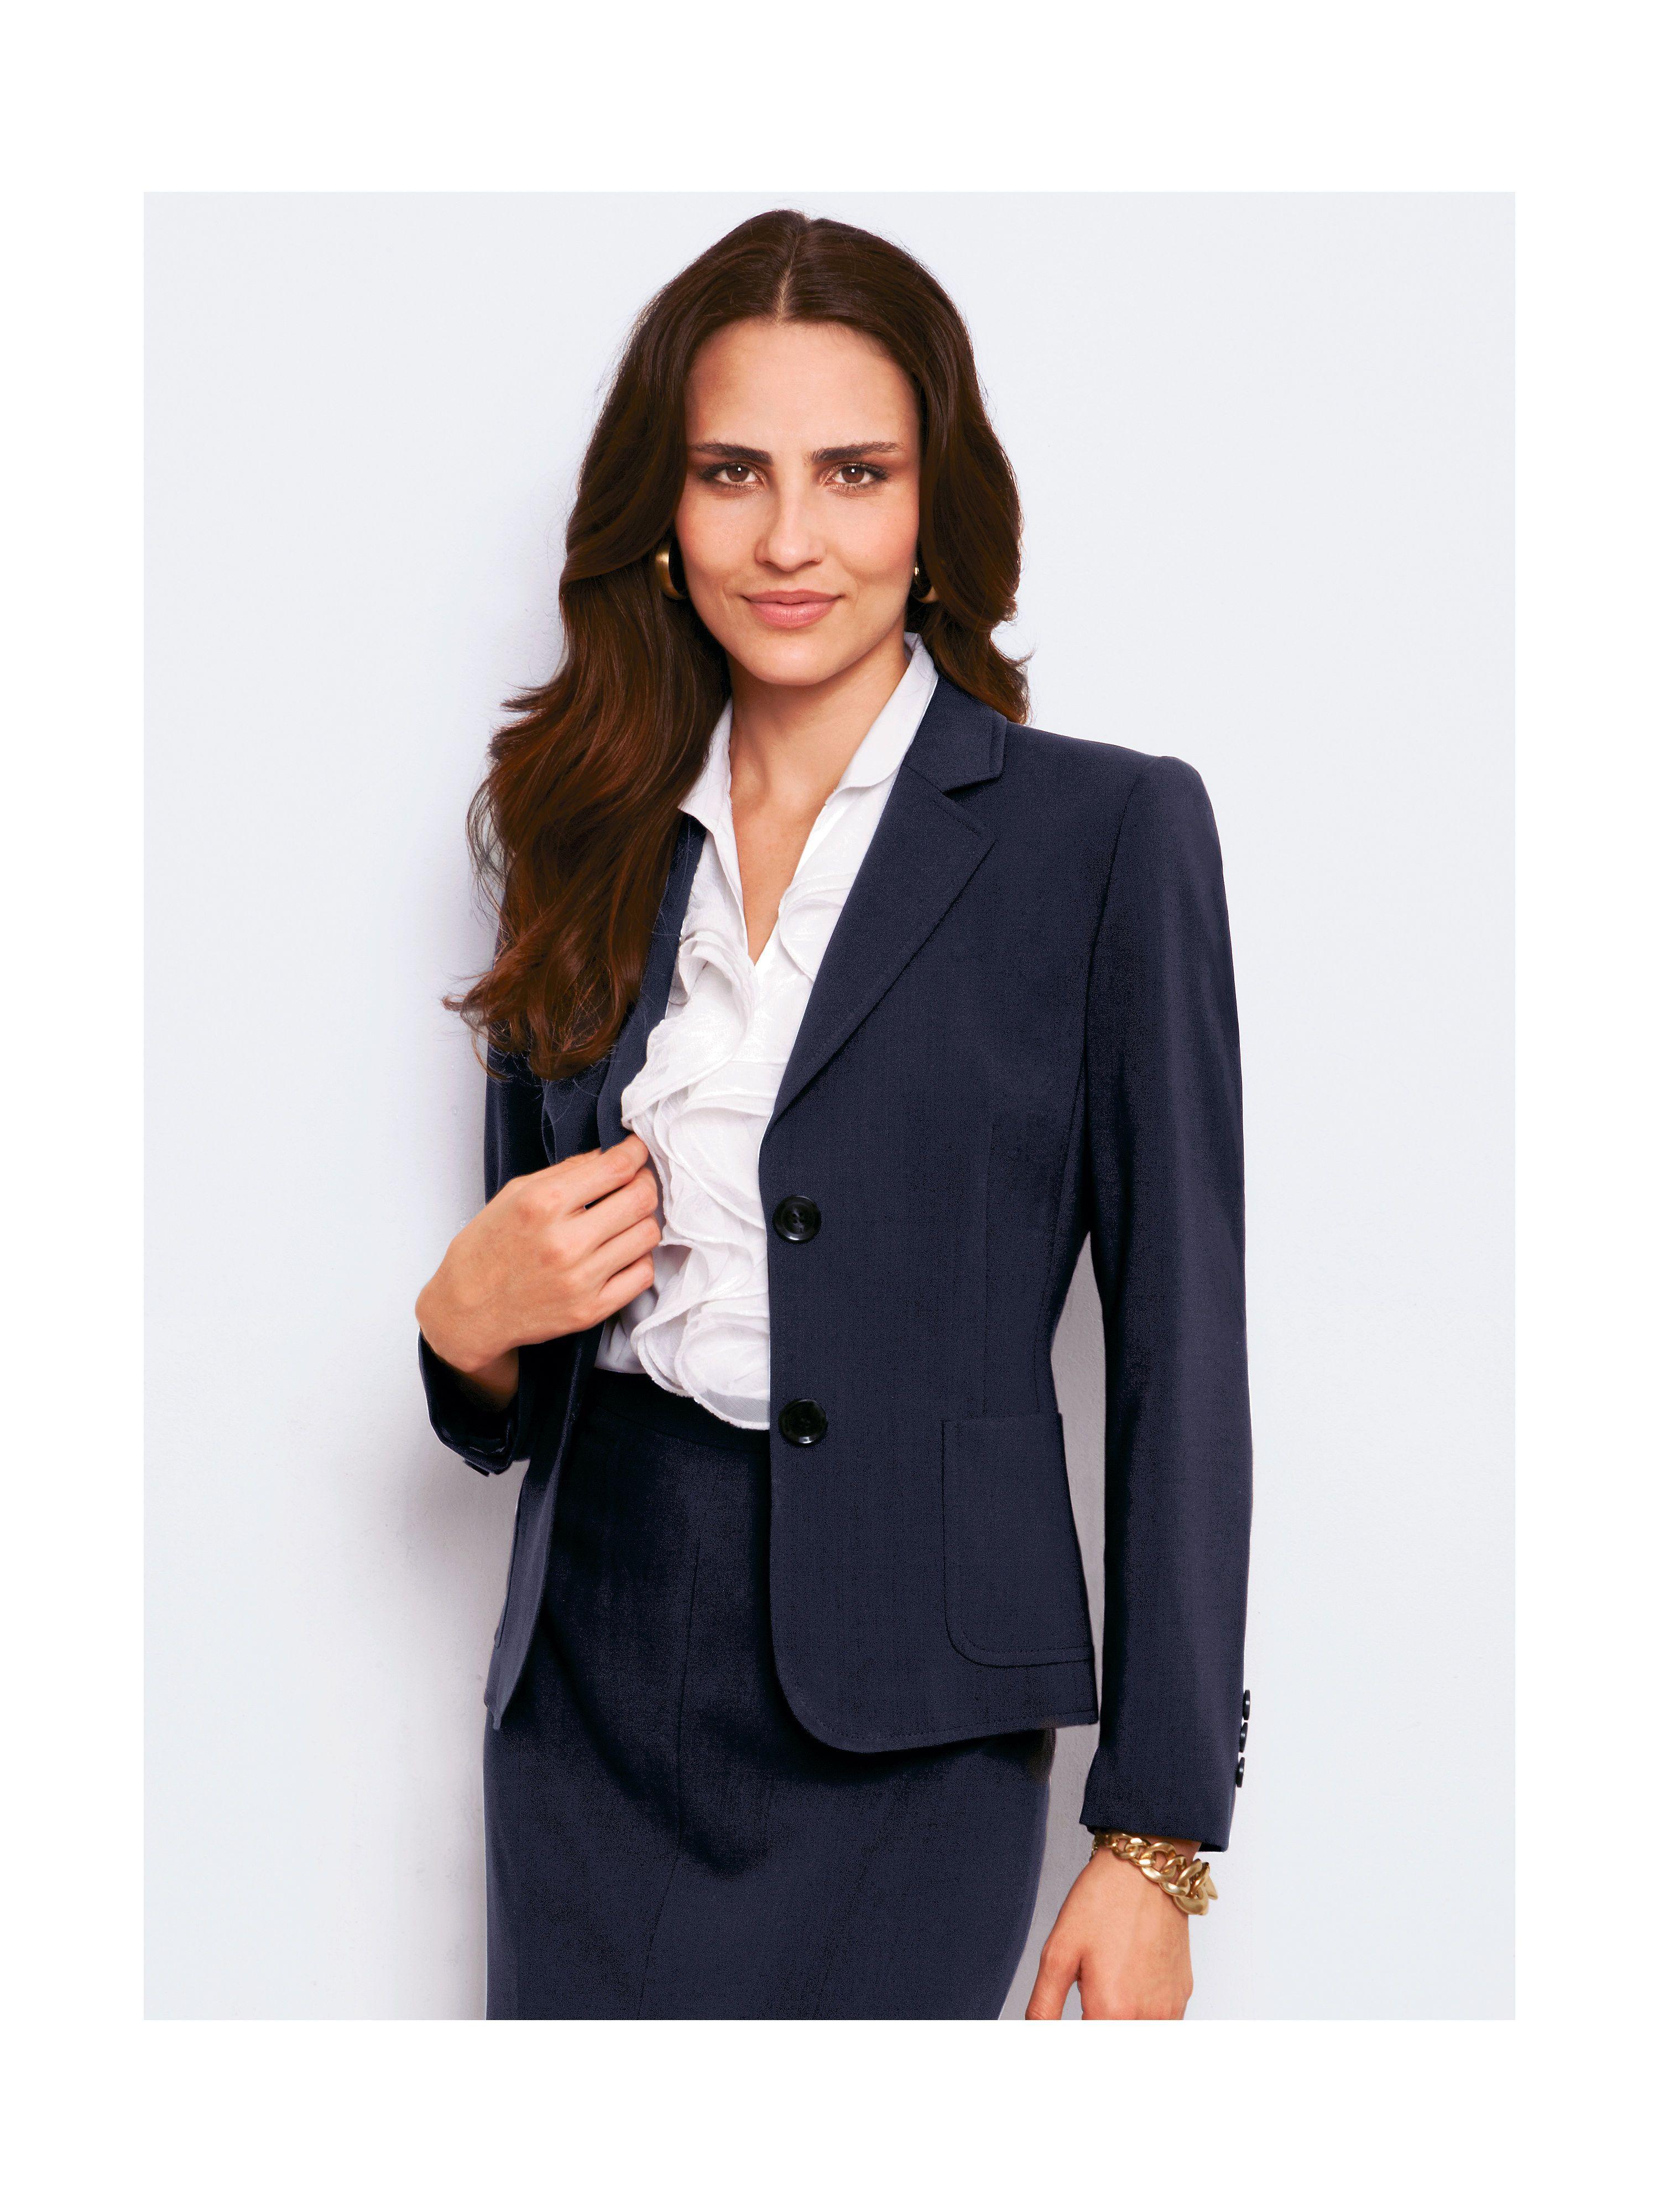 Hosenanzug business kleidung damen - Strenge Anzüge Foto ...